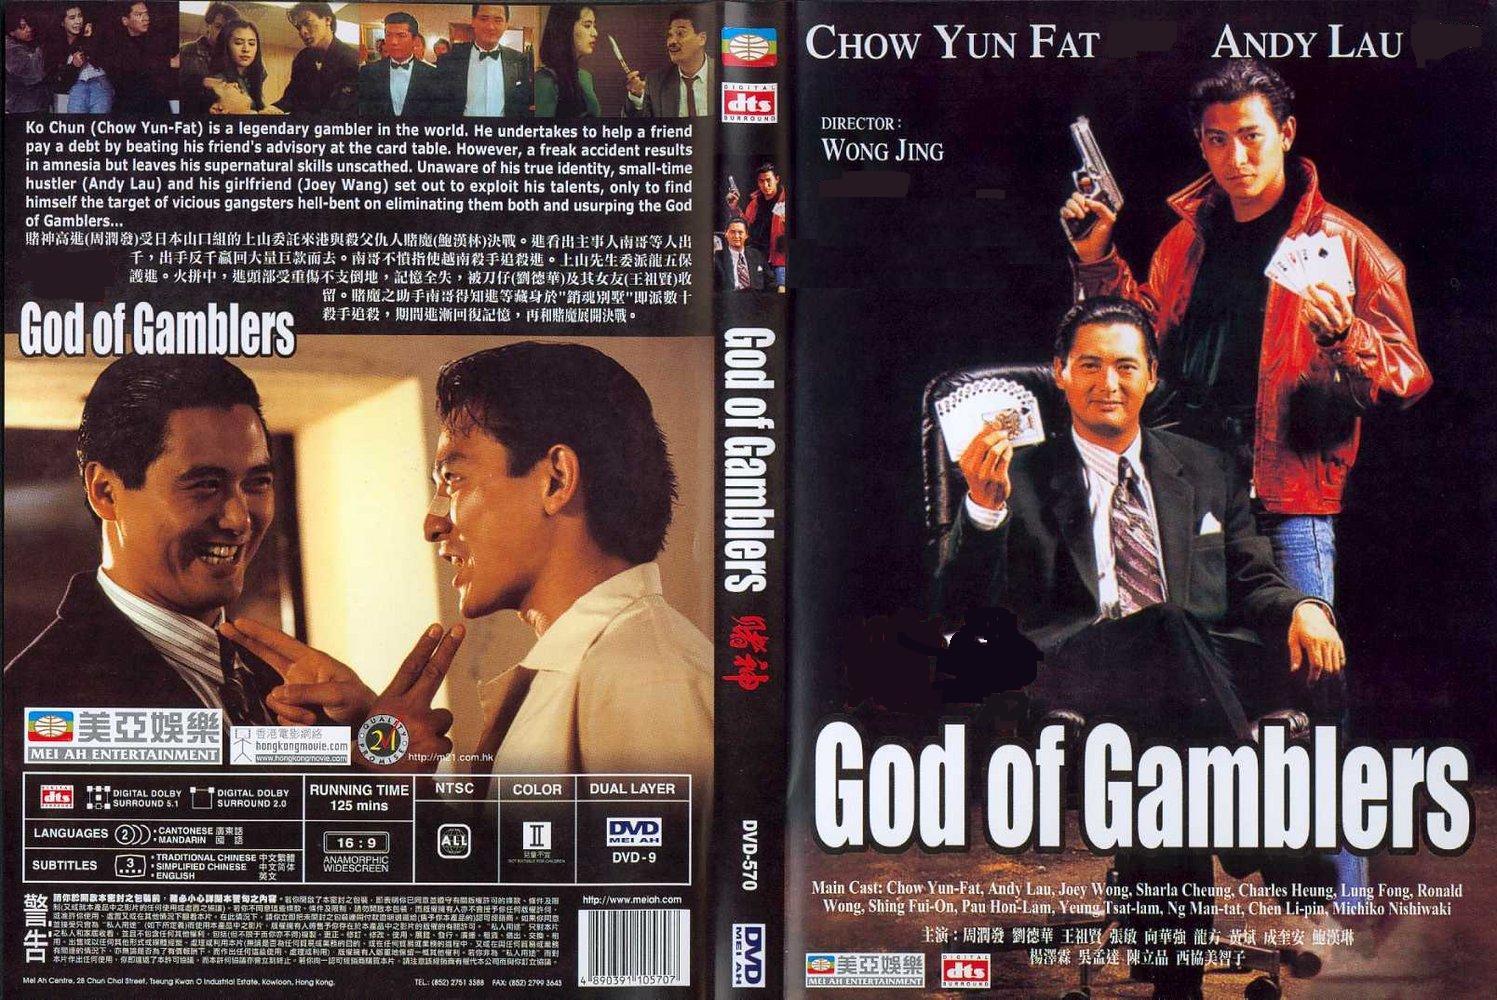 Kumarbazlar Efendisi (God Of Gamblers) 1989 Bdrip 720p.x264 Dual Türkce Dublaj (1) - barbarus